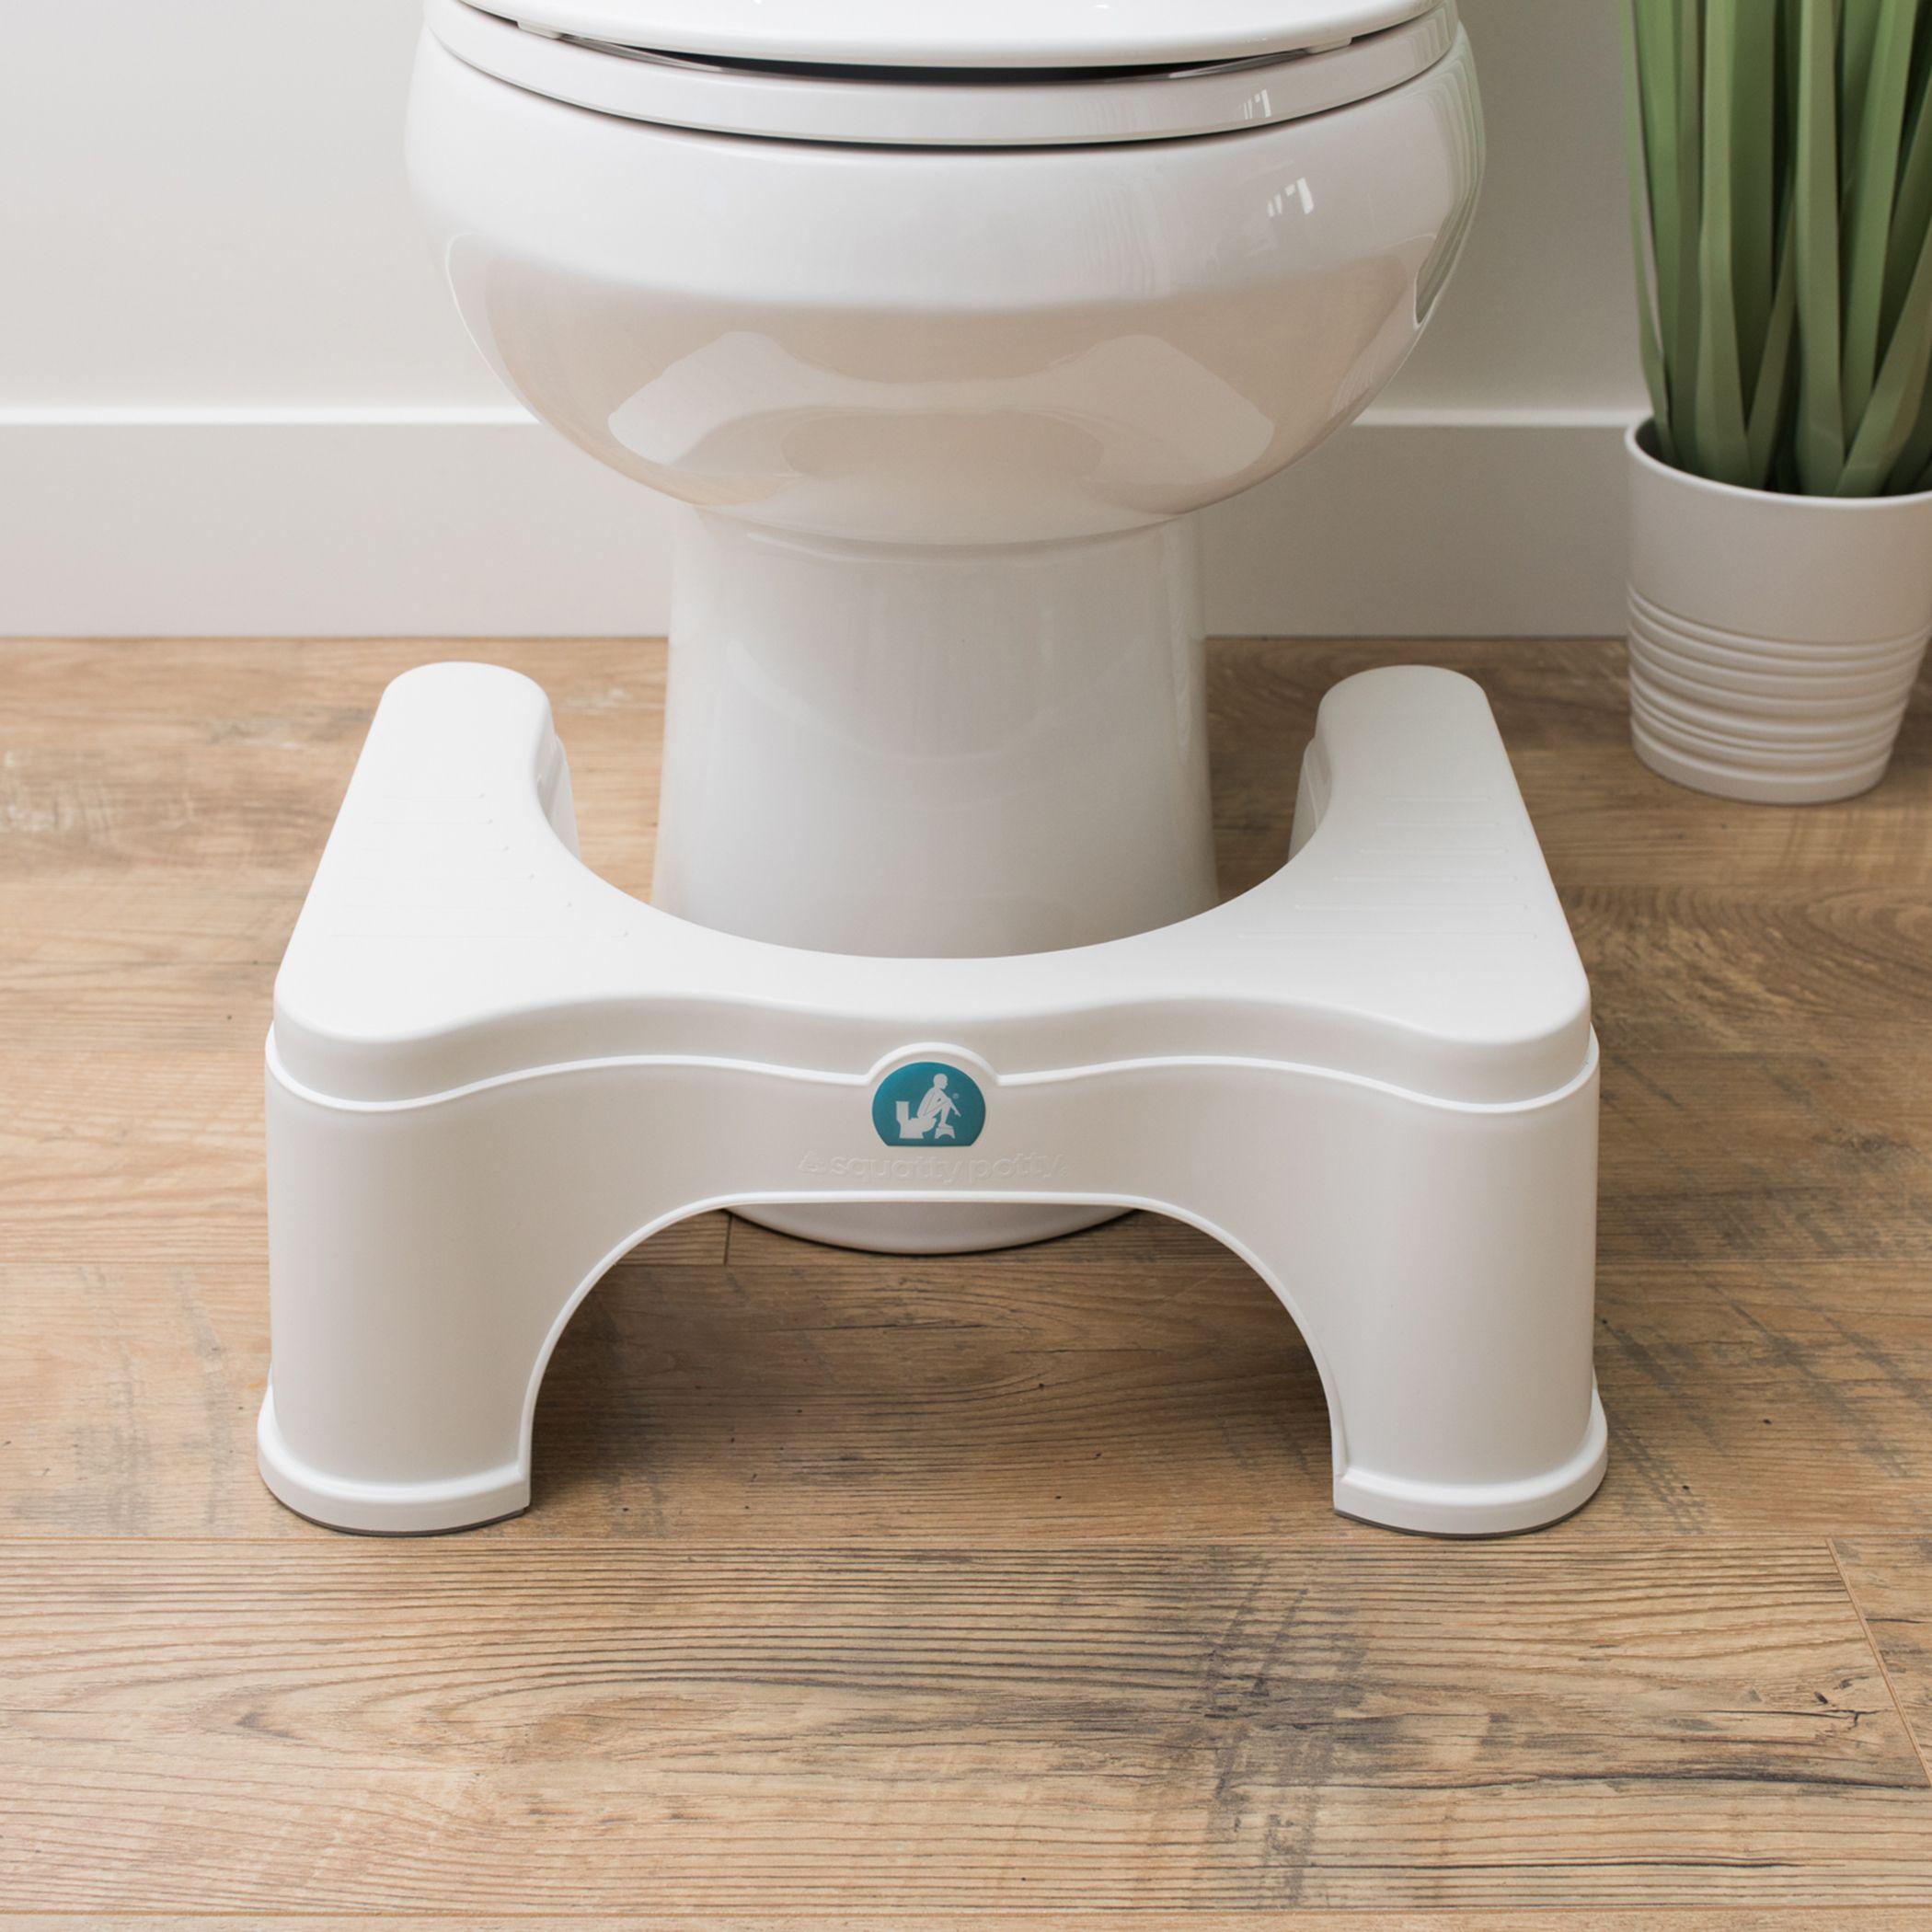 Squatty Potty Ecco 2 Base Toilet Stool  sc 1 st  Kohlu0027s & Potty Ecco 2 Base Toilet Stool islam-shia.org